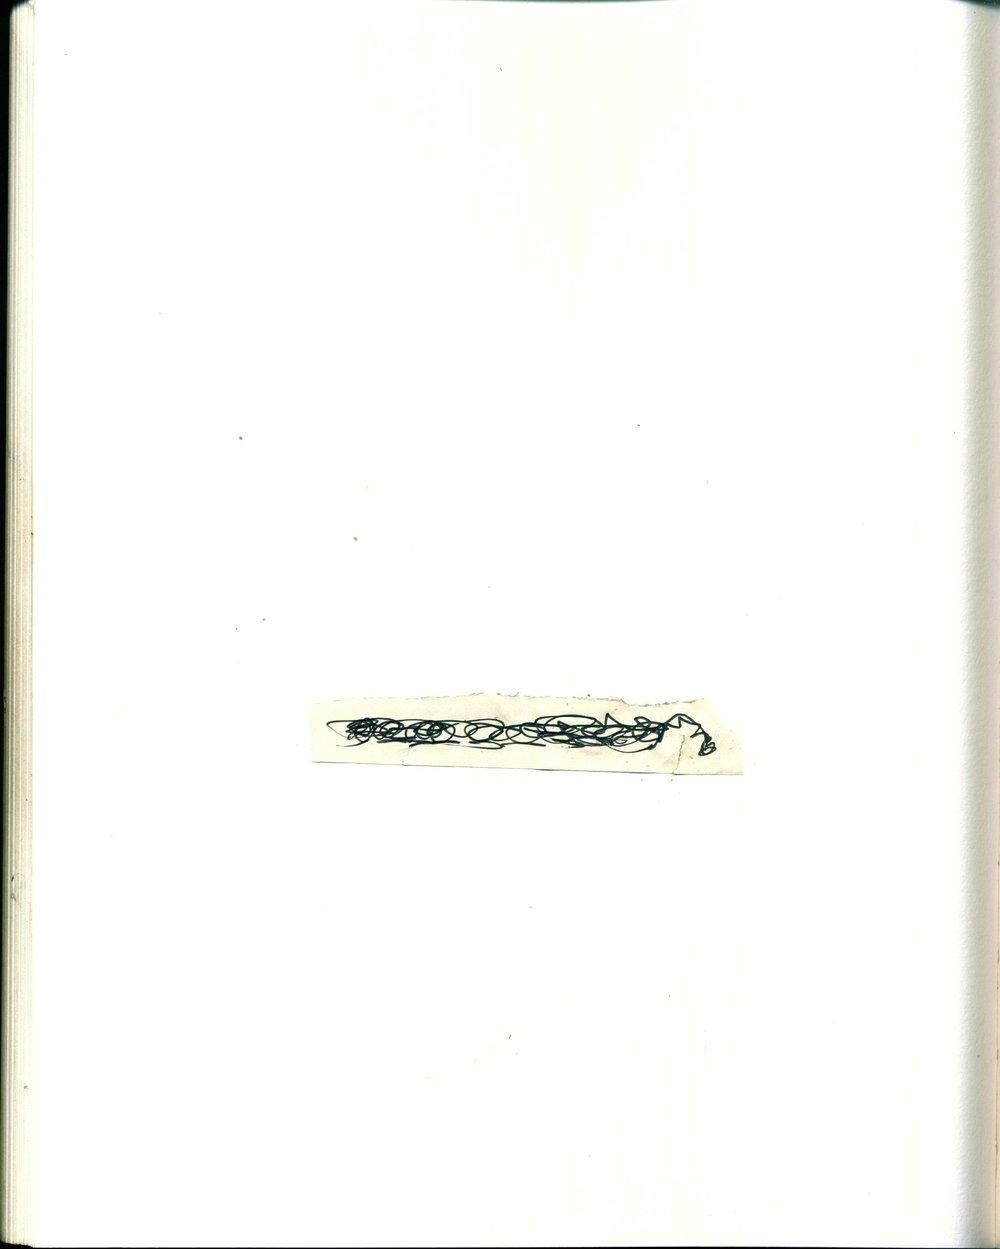 notebook0061.jpg